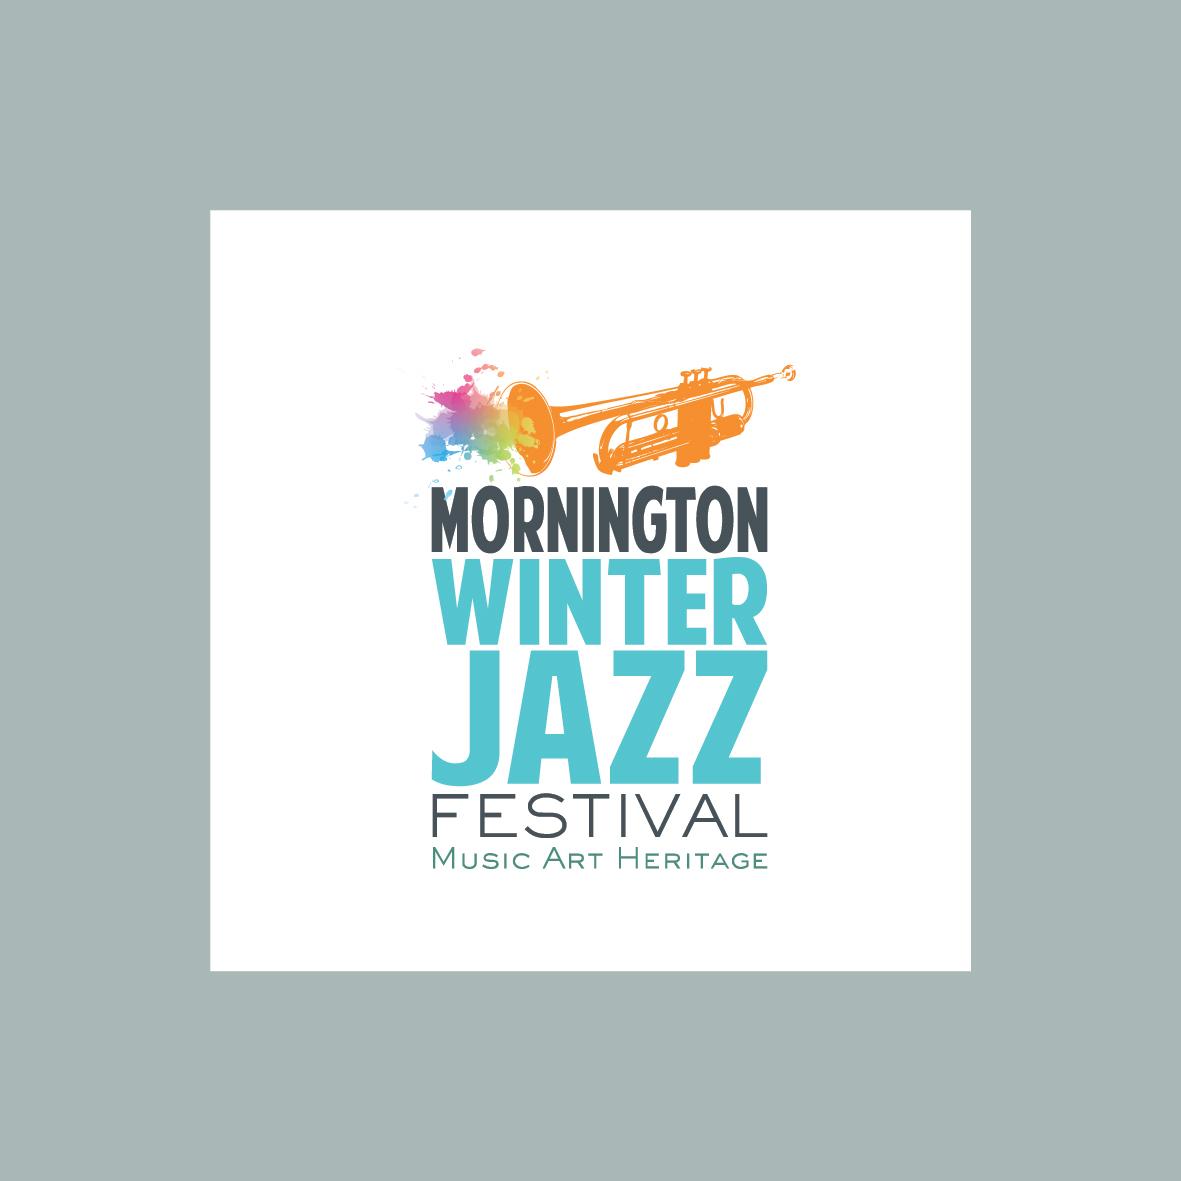 Mornington Winter Jazz Festival Logo